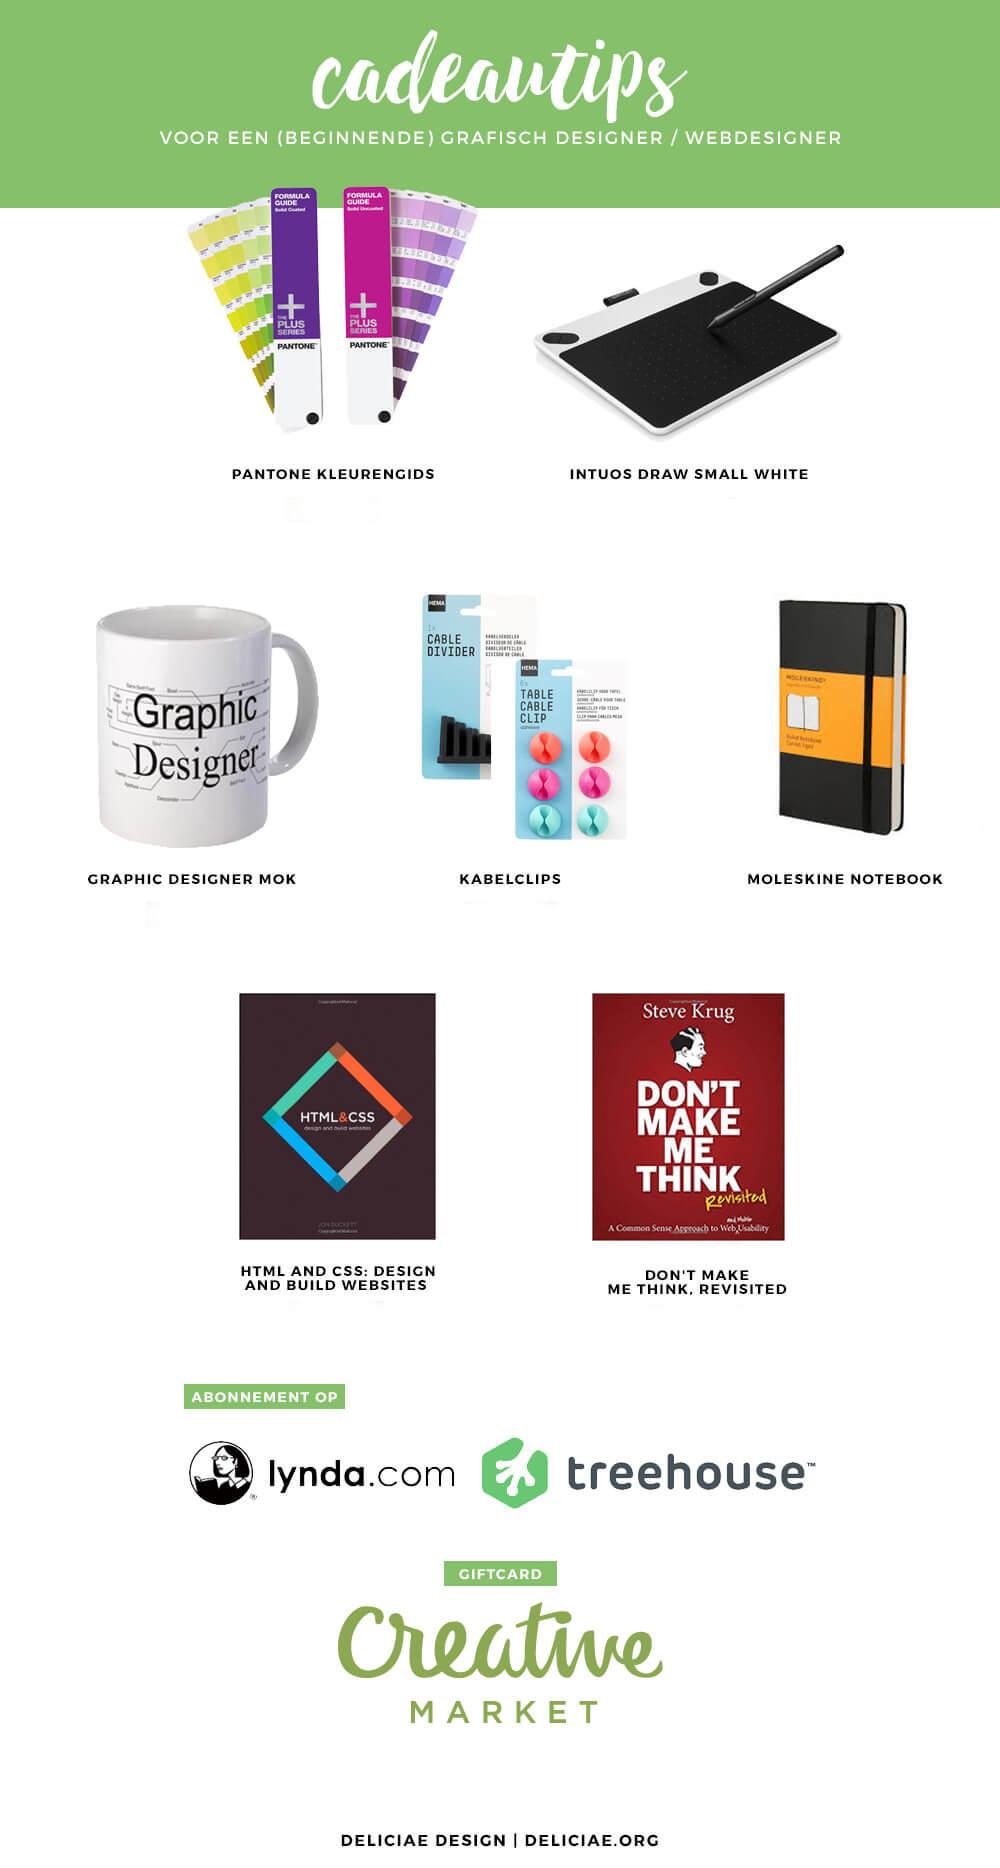 cadeau idee webdesigner